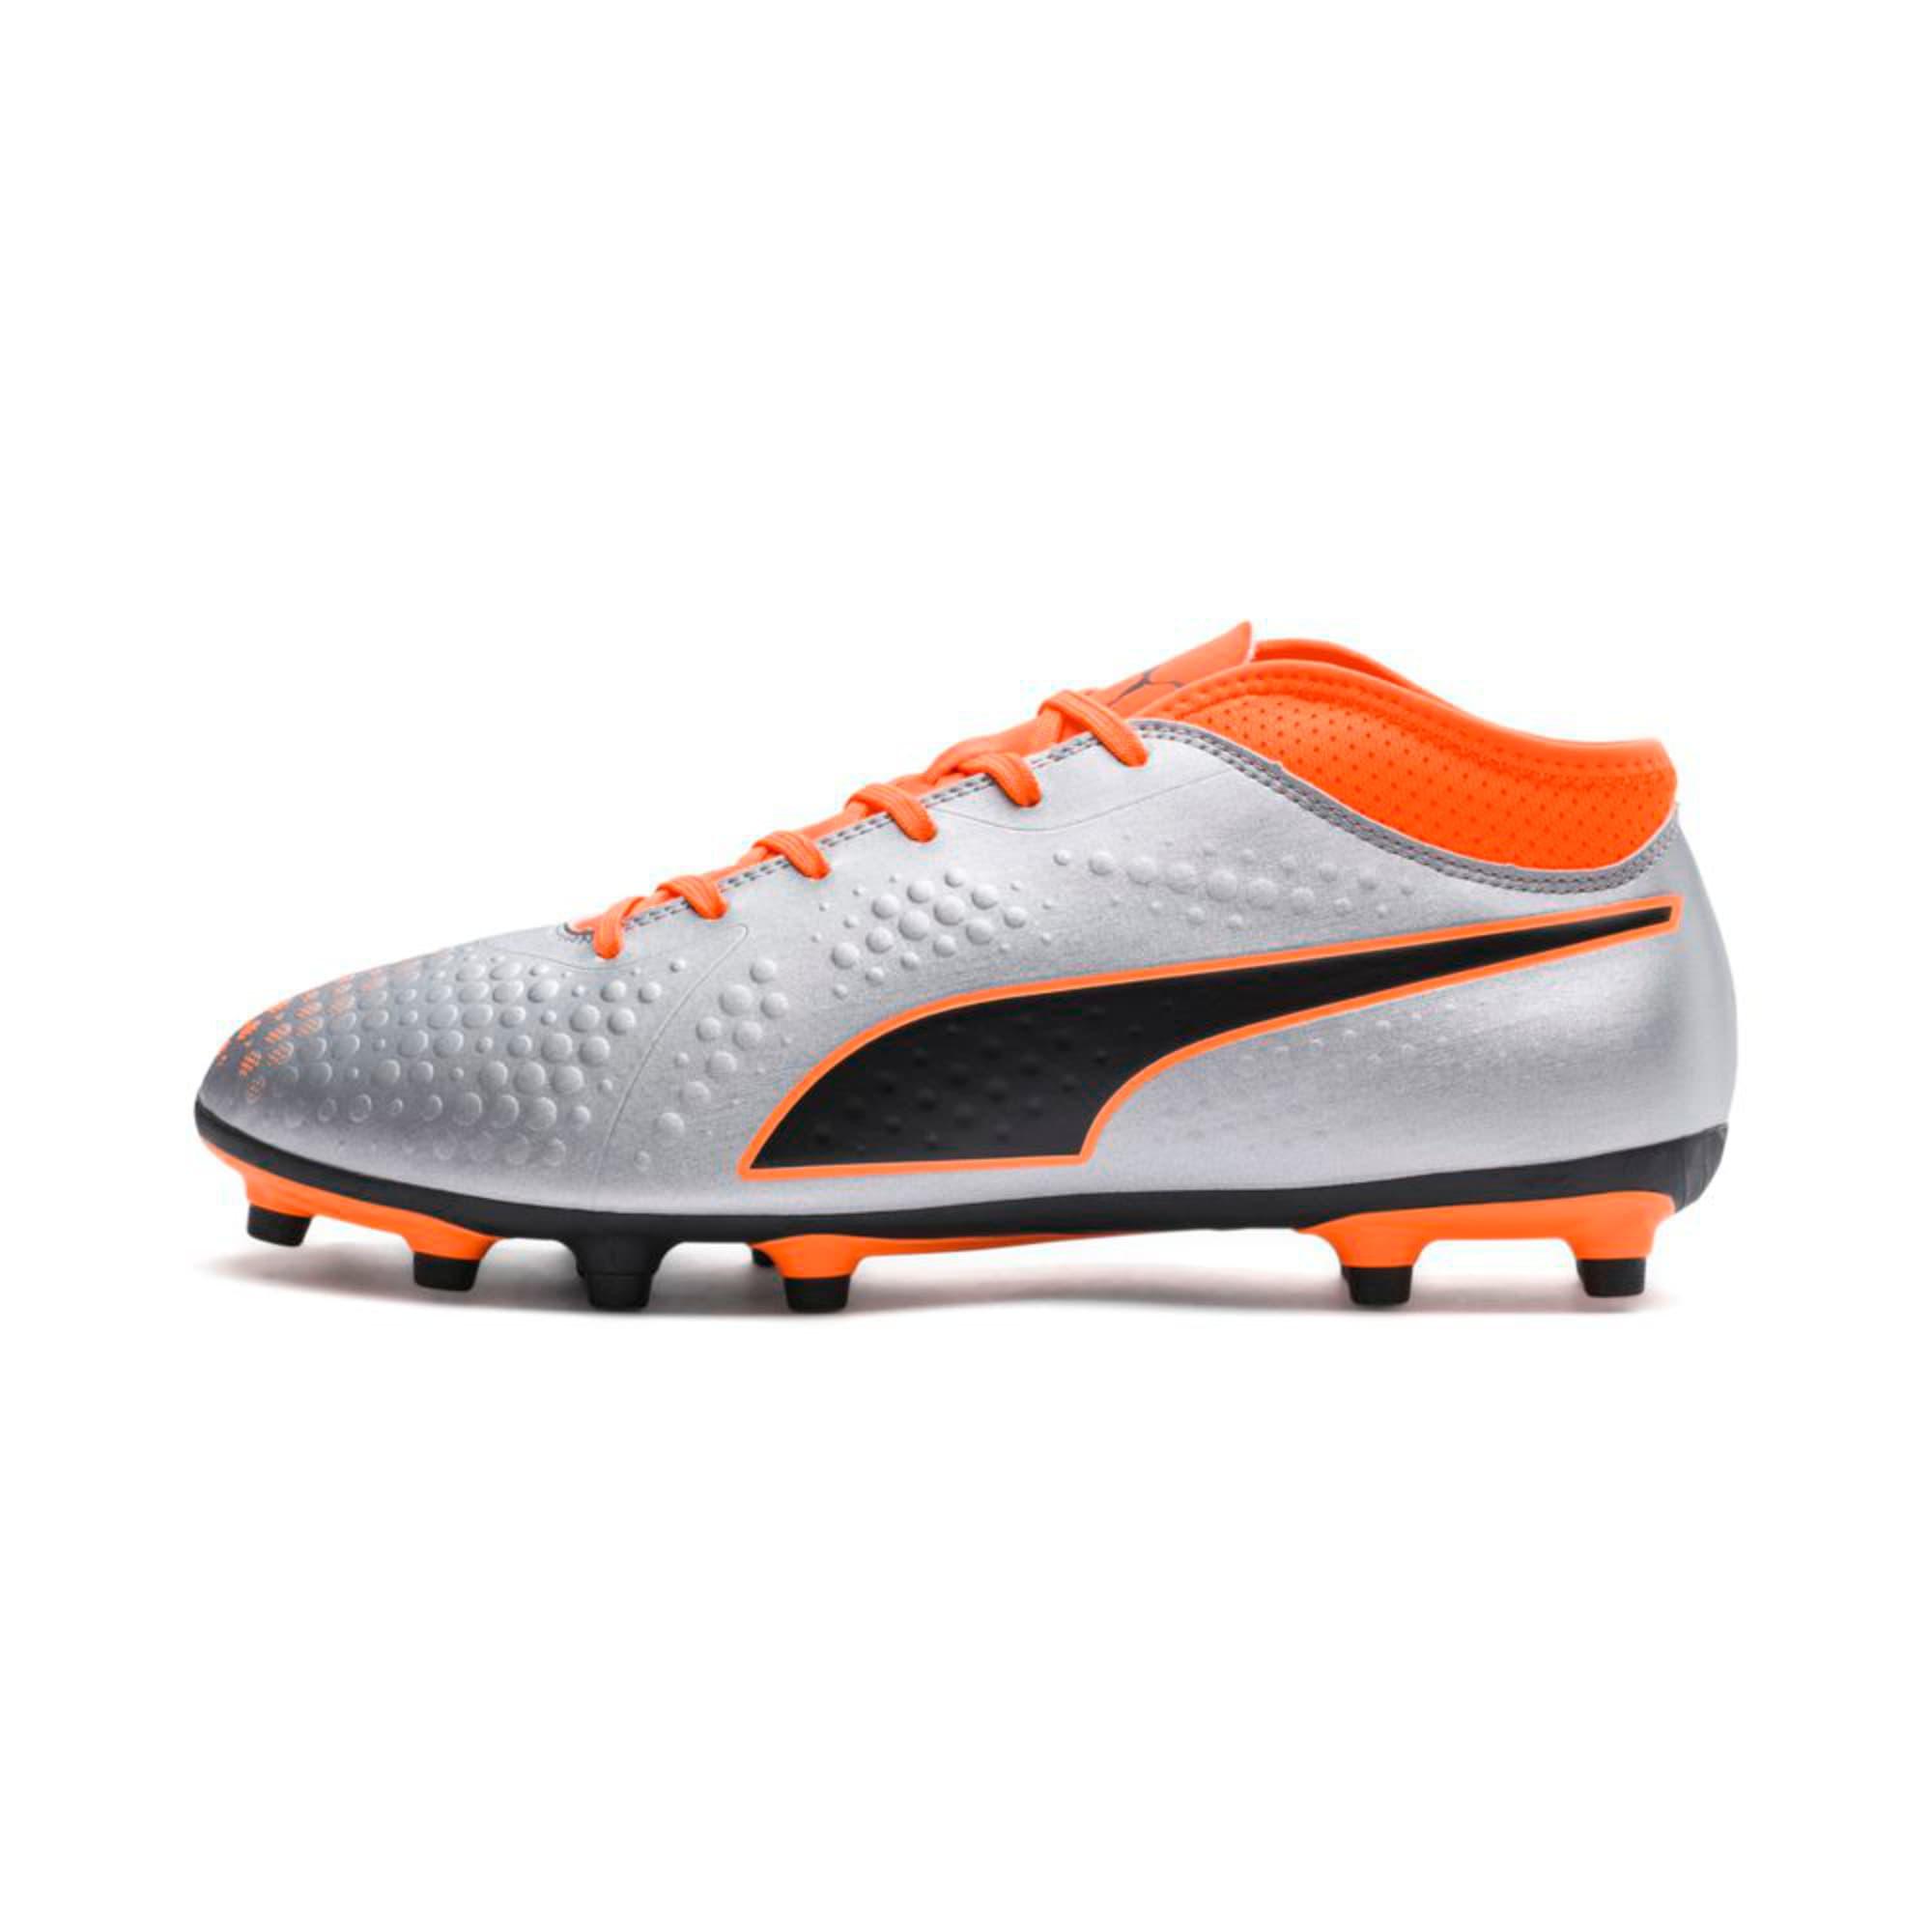 Thumbnail 1 of PUMA ONE 4 Synthetic FG Men's Football Boots, Silver-Orange-Black, medium-IND